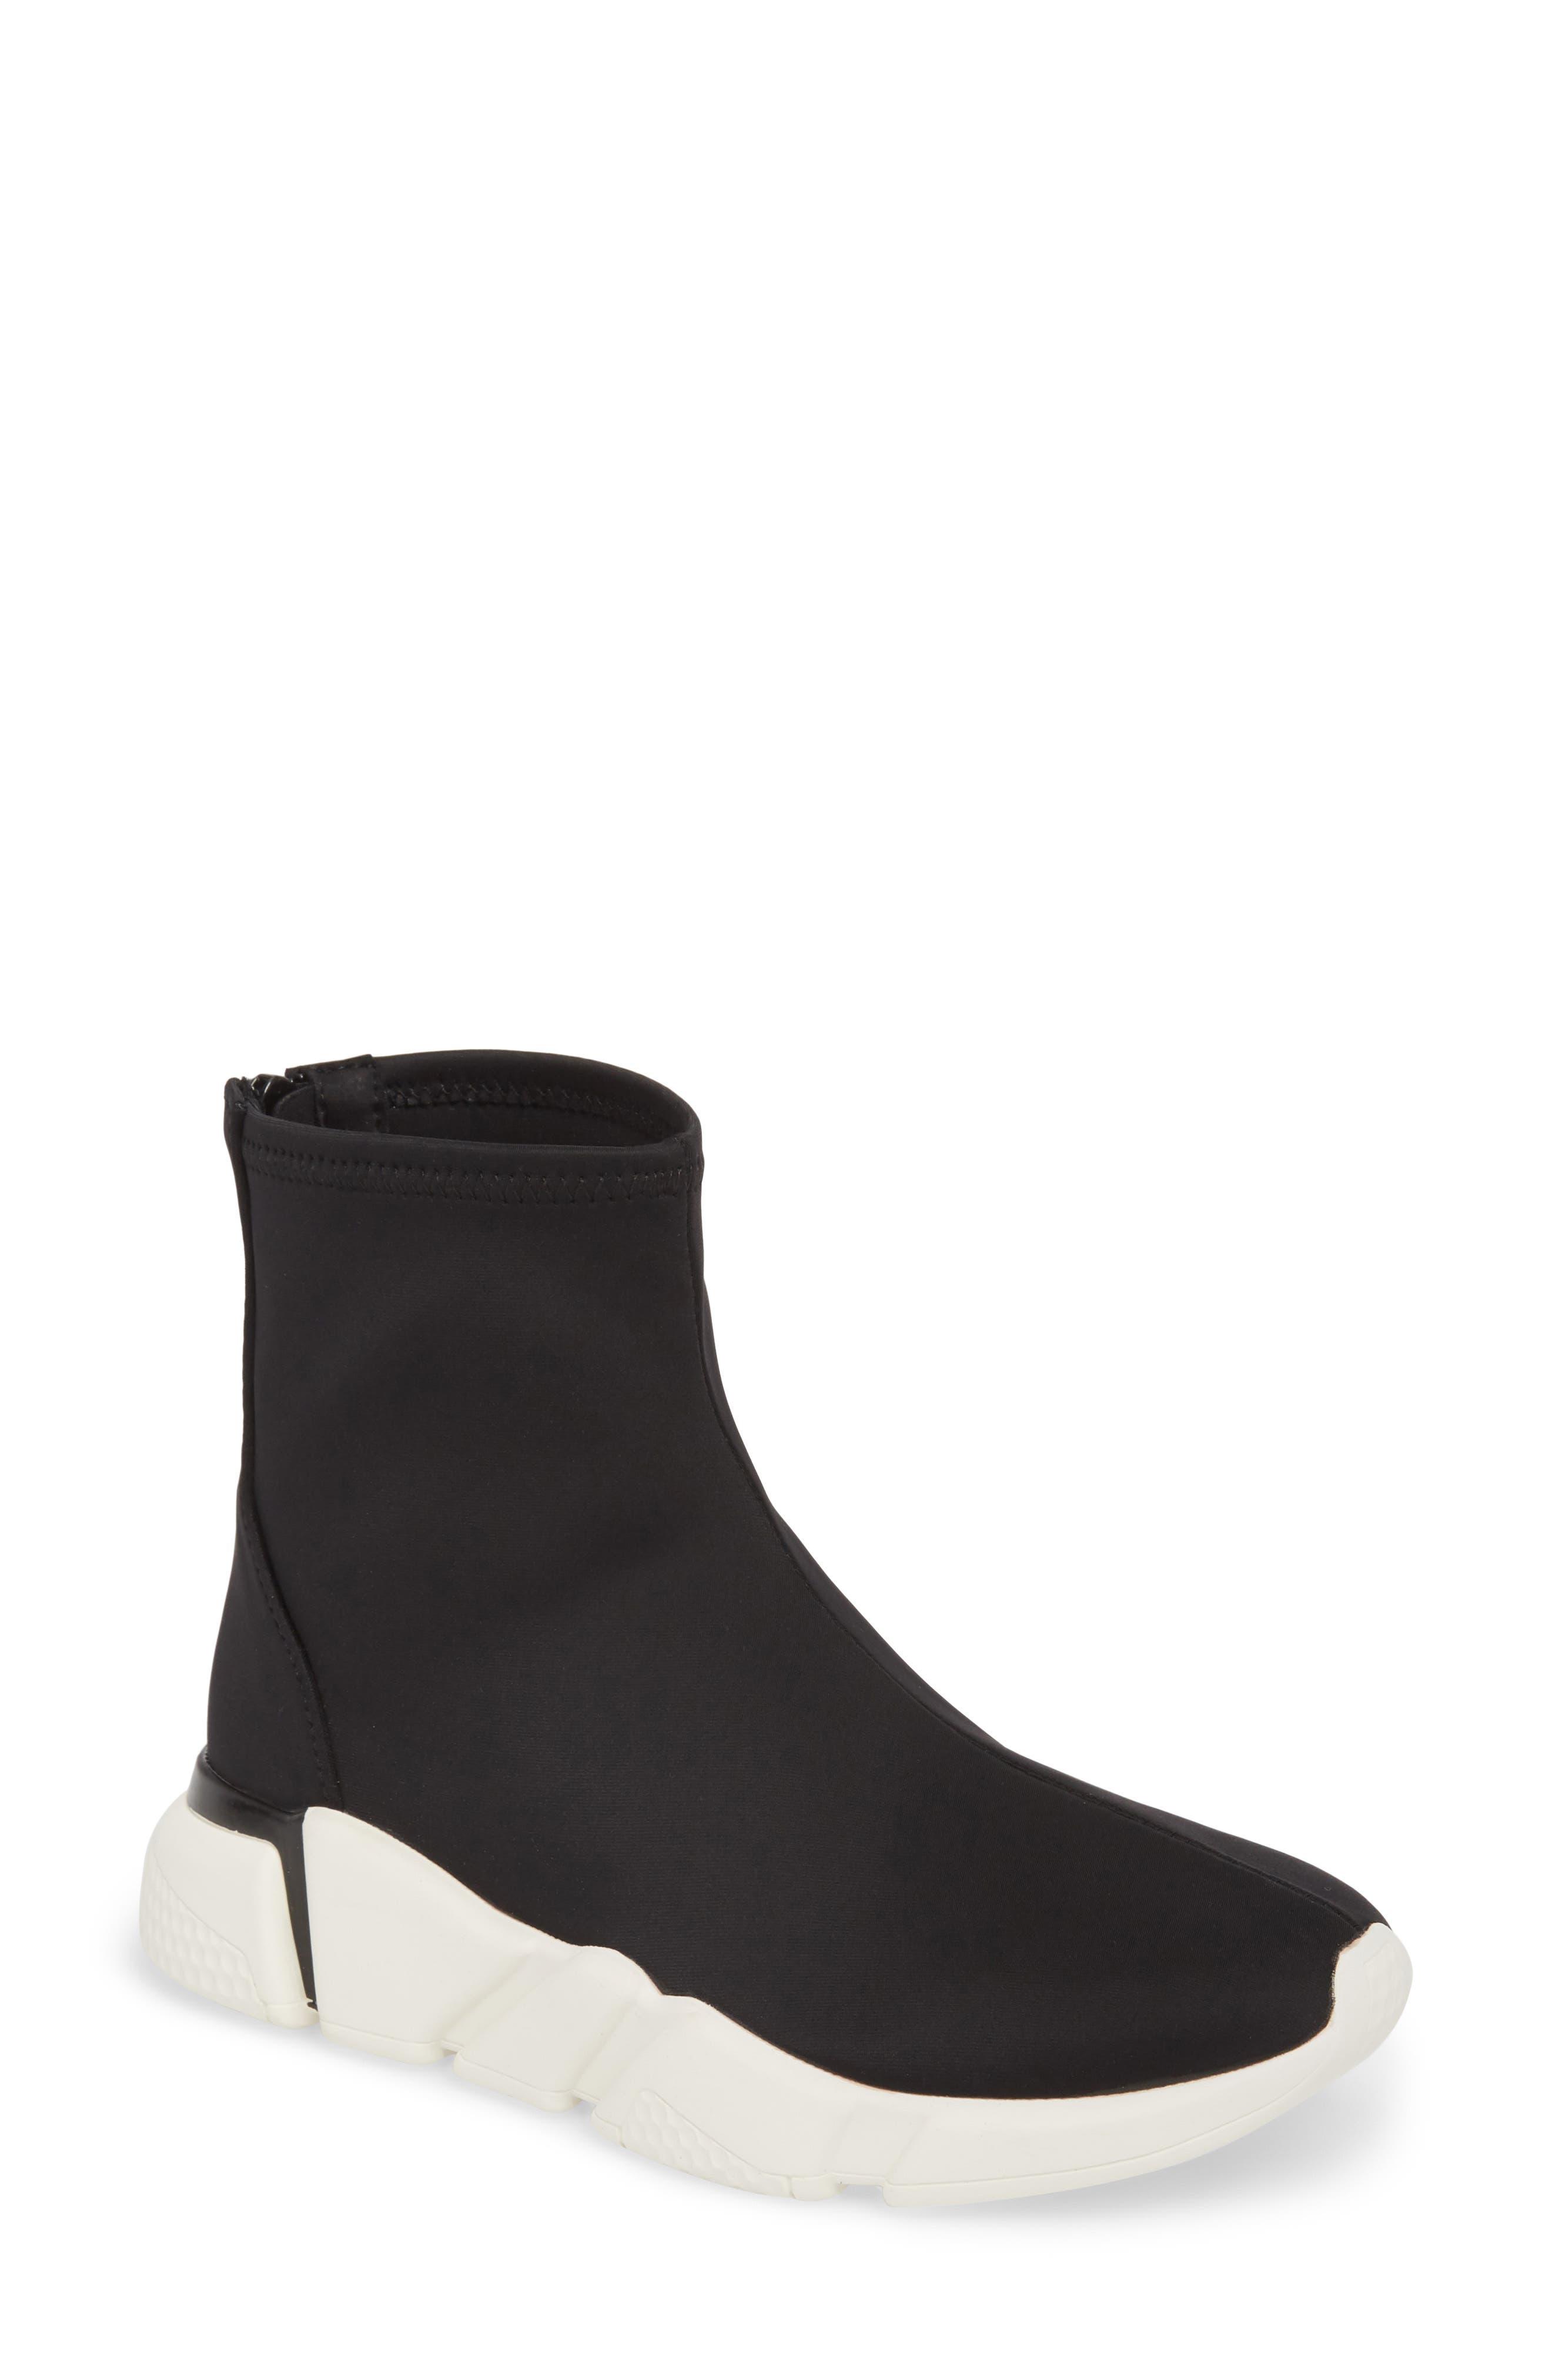 Sock Sneaker,                             Main thumbnail 1, color,                             BLACK / WHITE